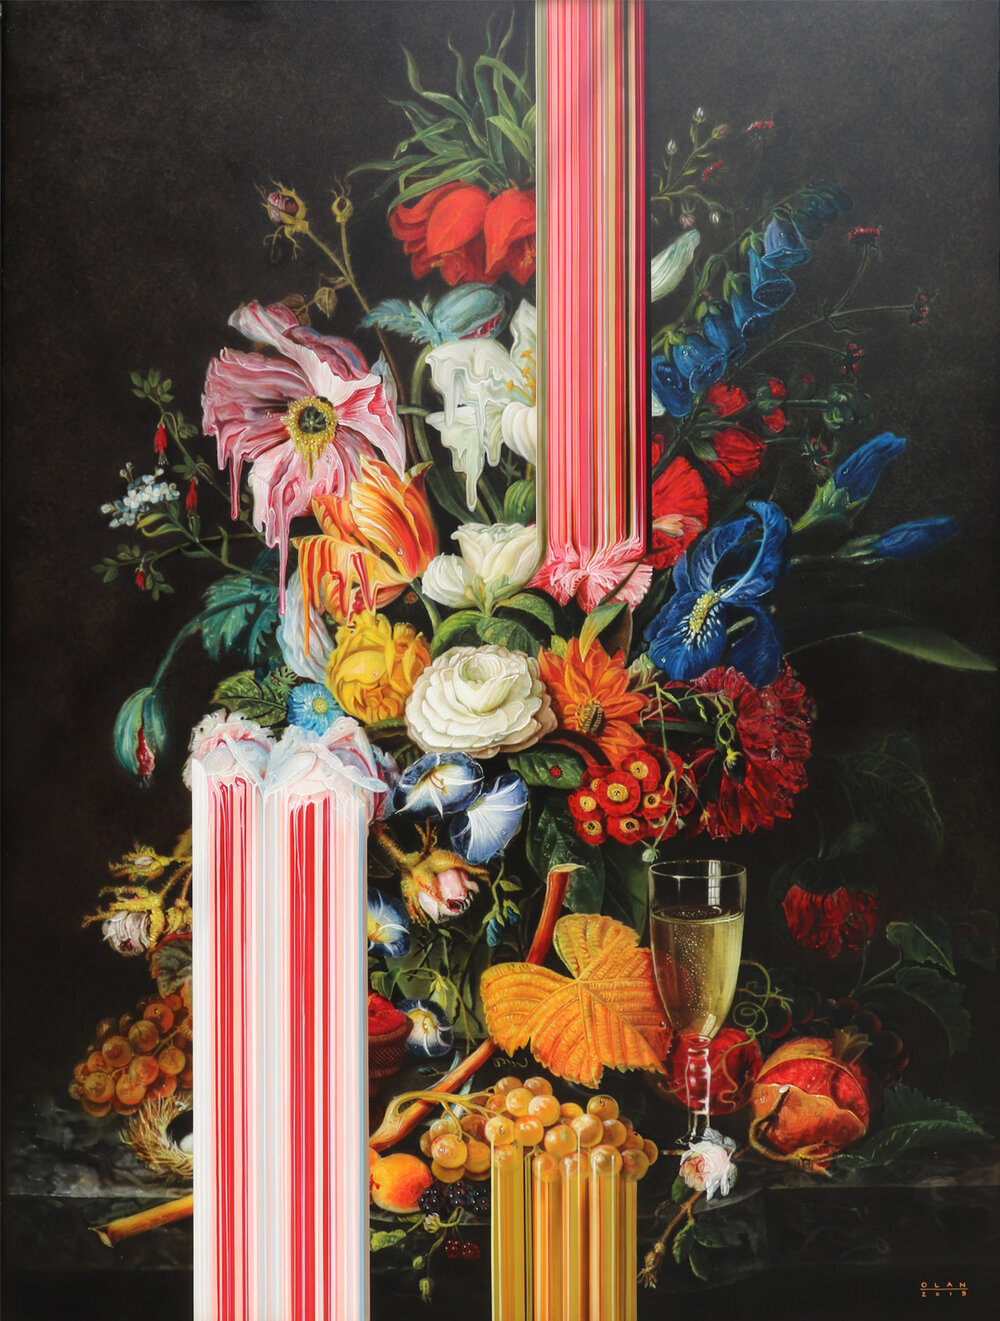 """Abundant Bouquet with Pomegranate"" (2019), acrylic on canvas, 162.5 x 121.9 cm"